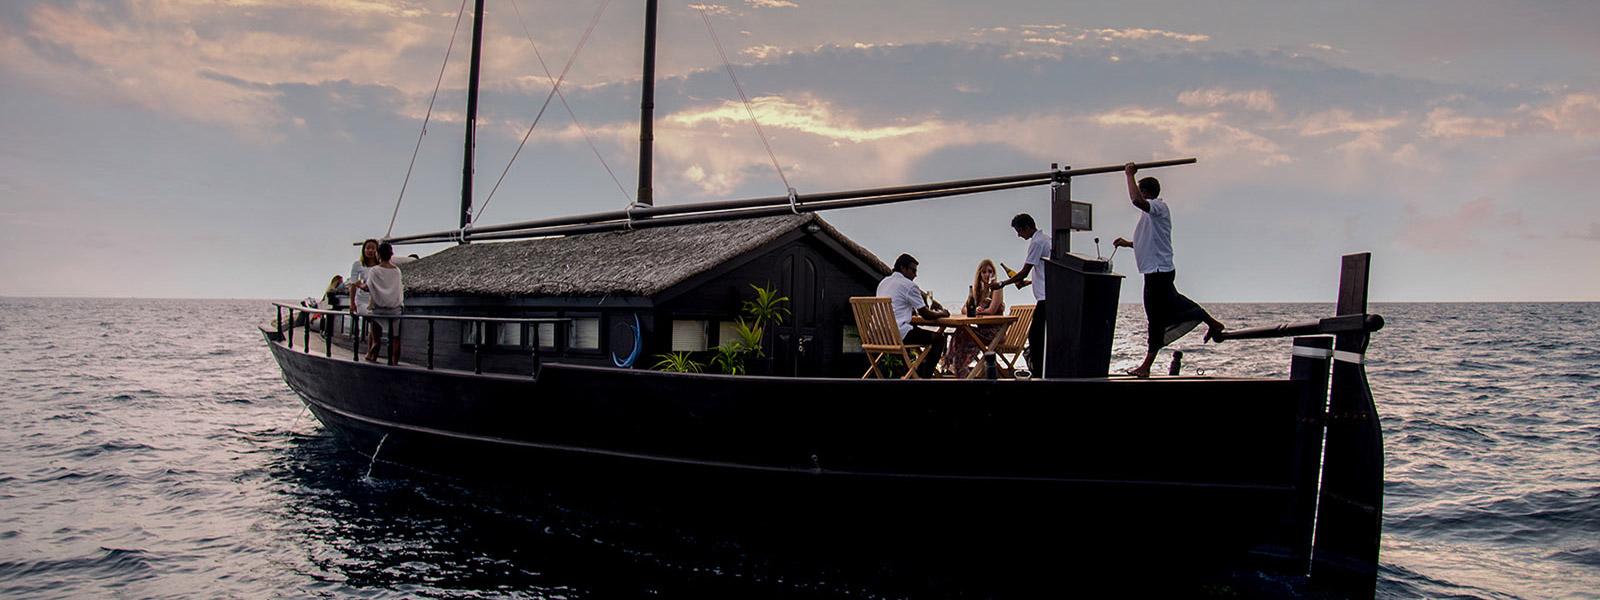 Maldives Luxury Cruise Excursions